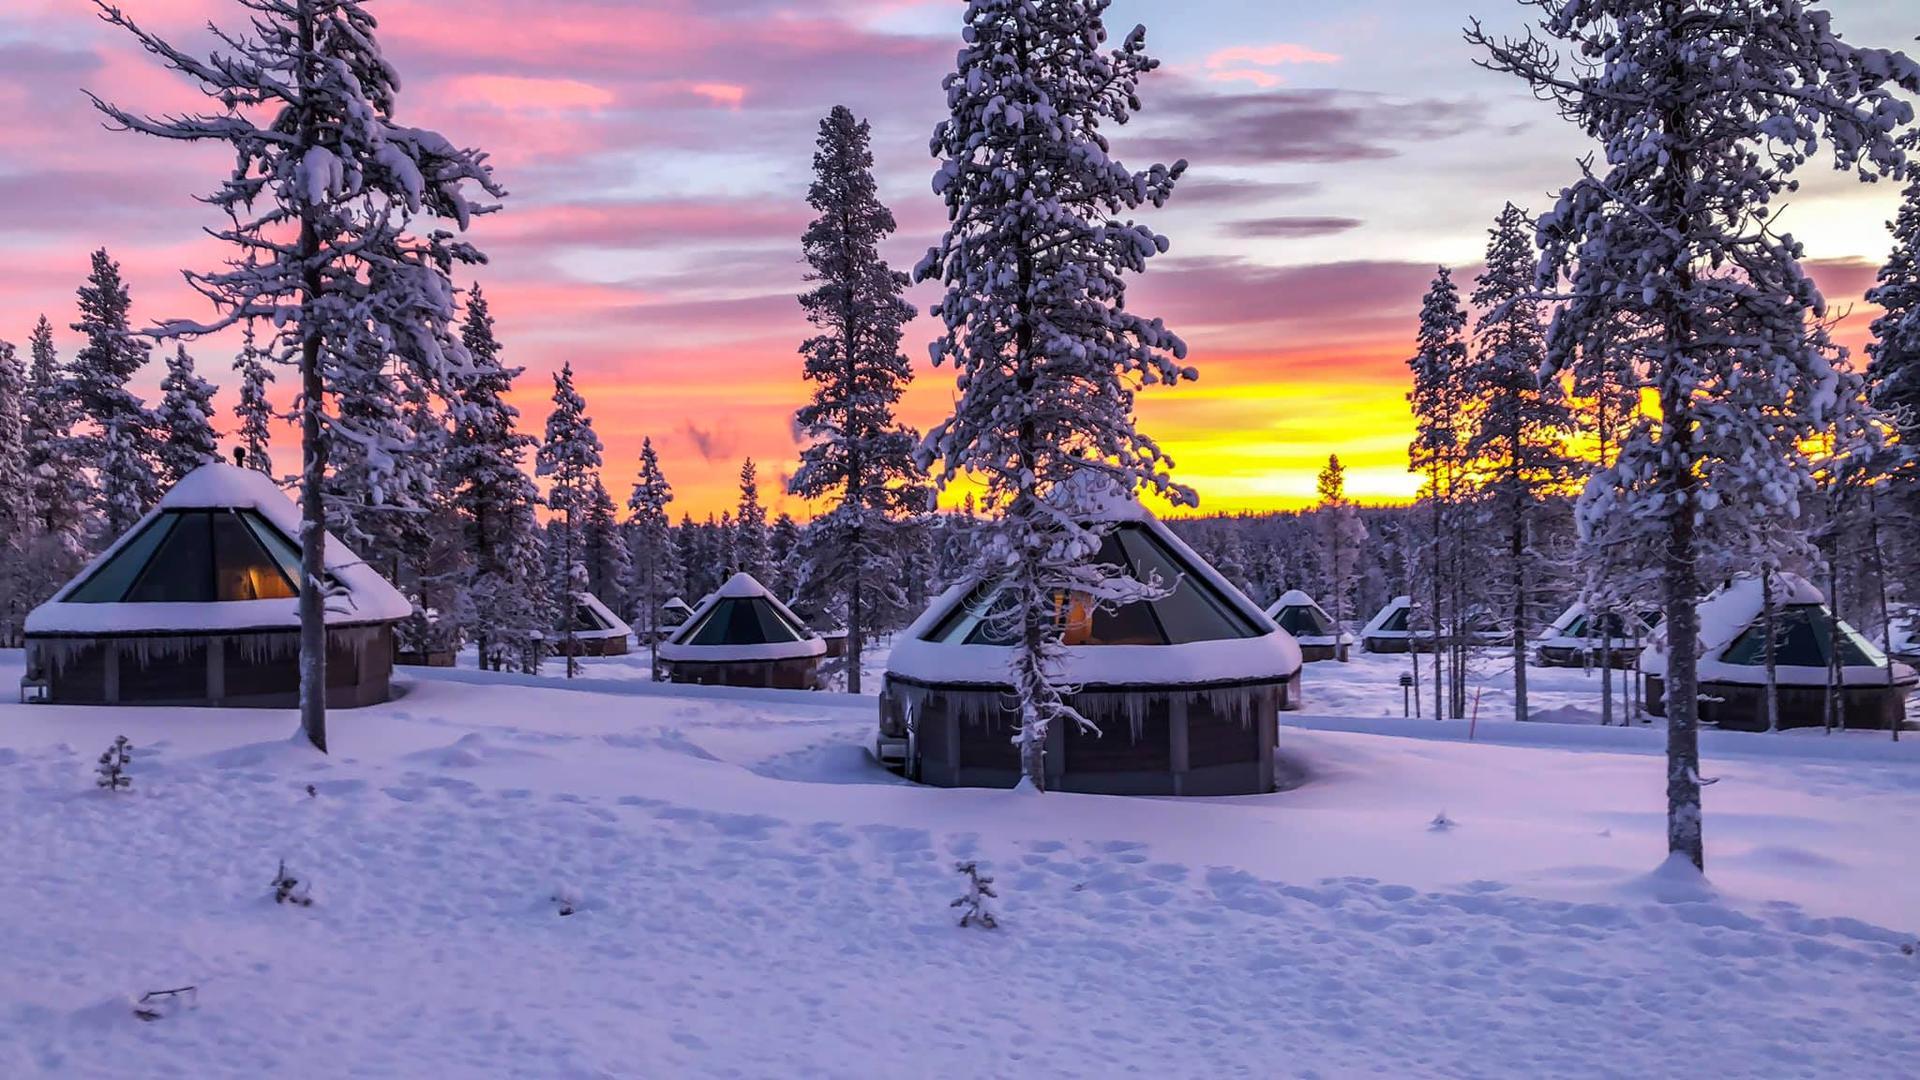 Glassroof accommodation at Northern Lights Village in Saariselkä